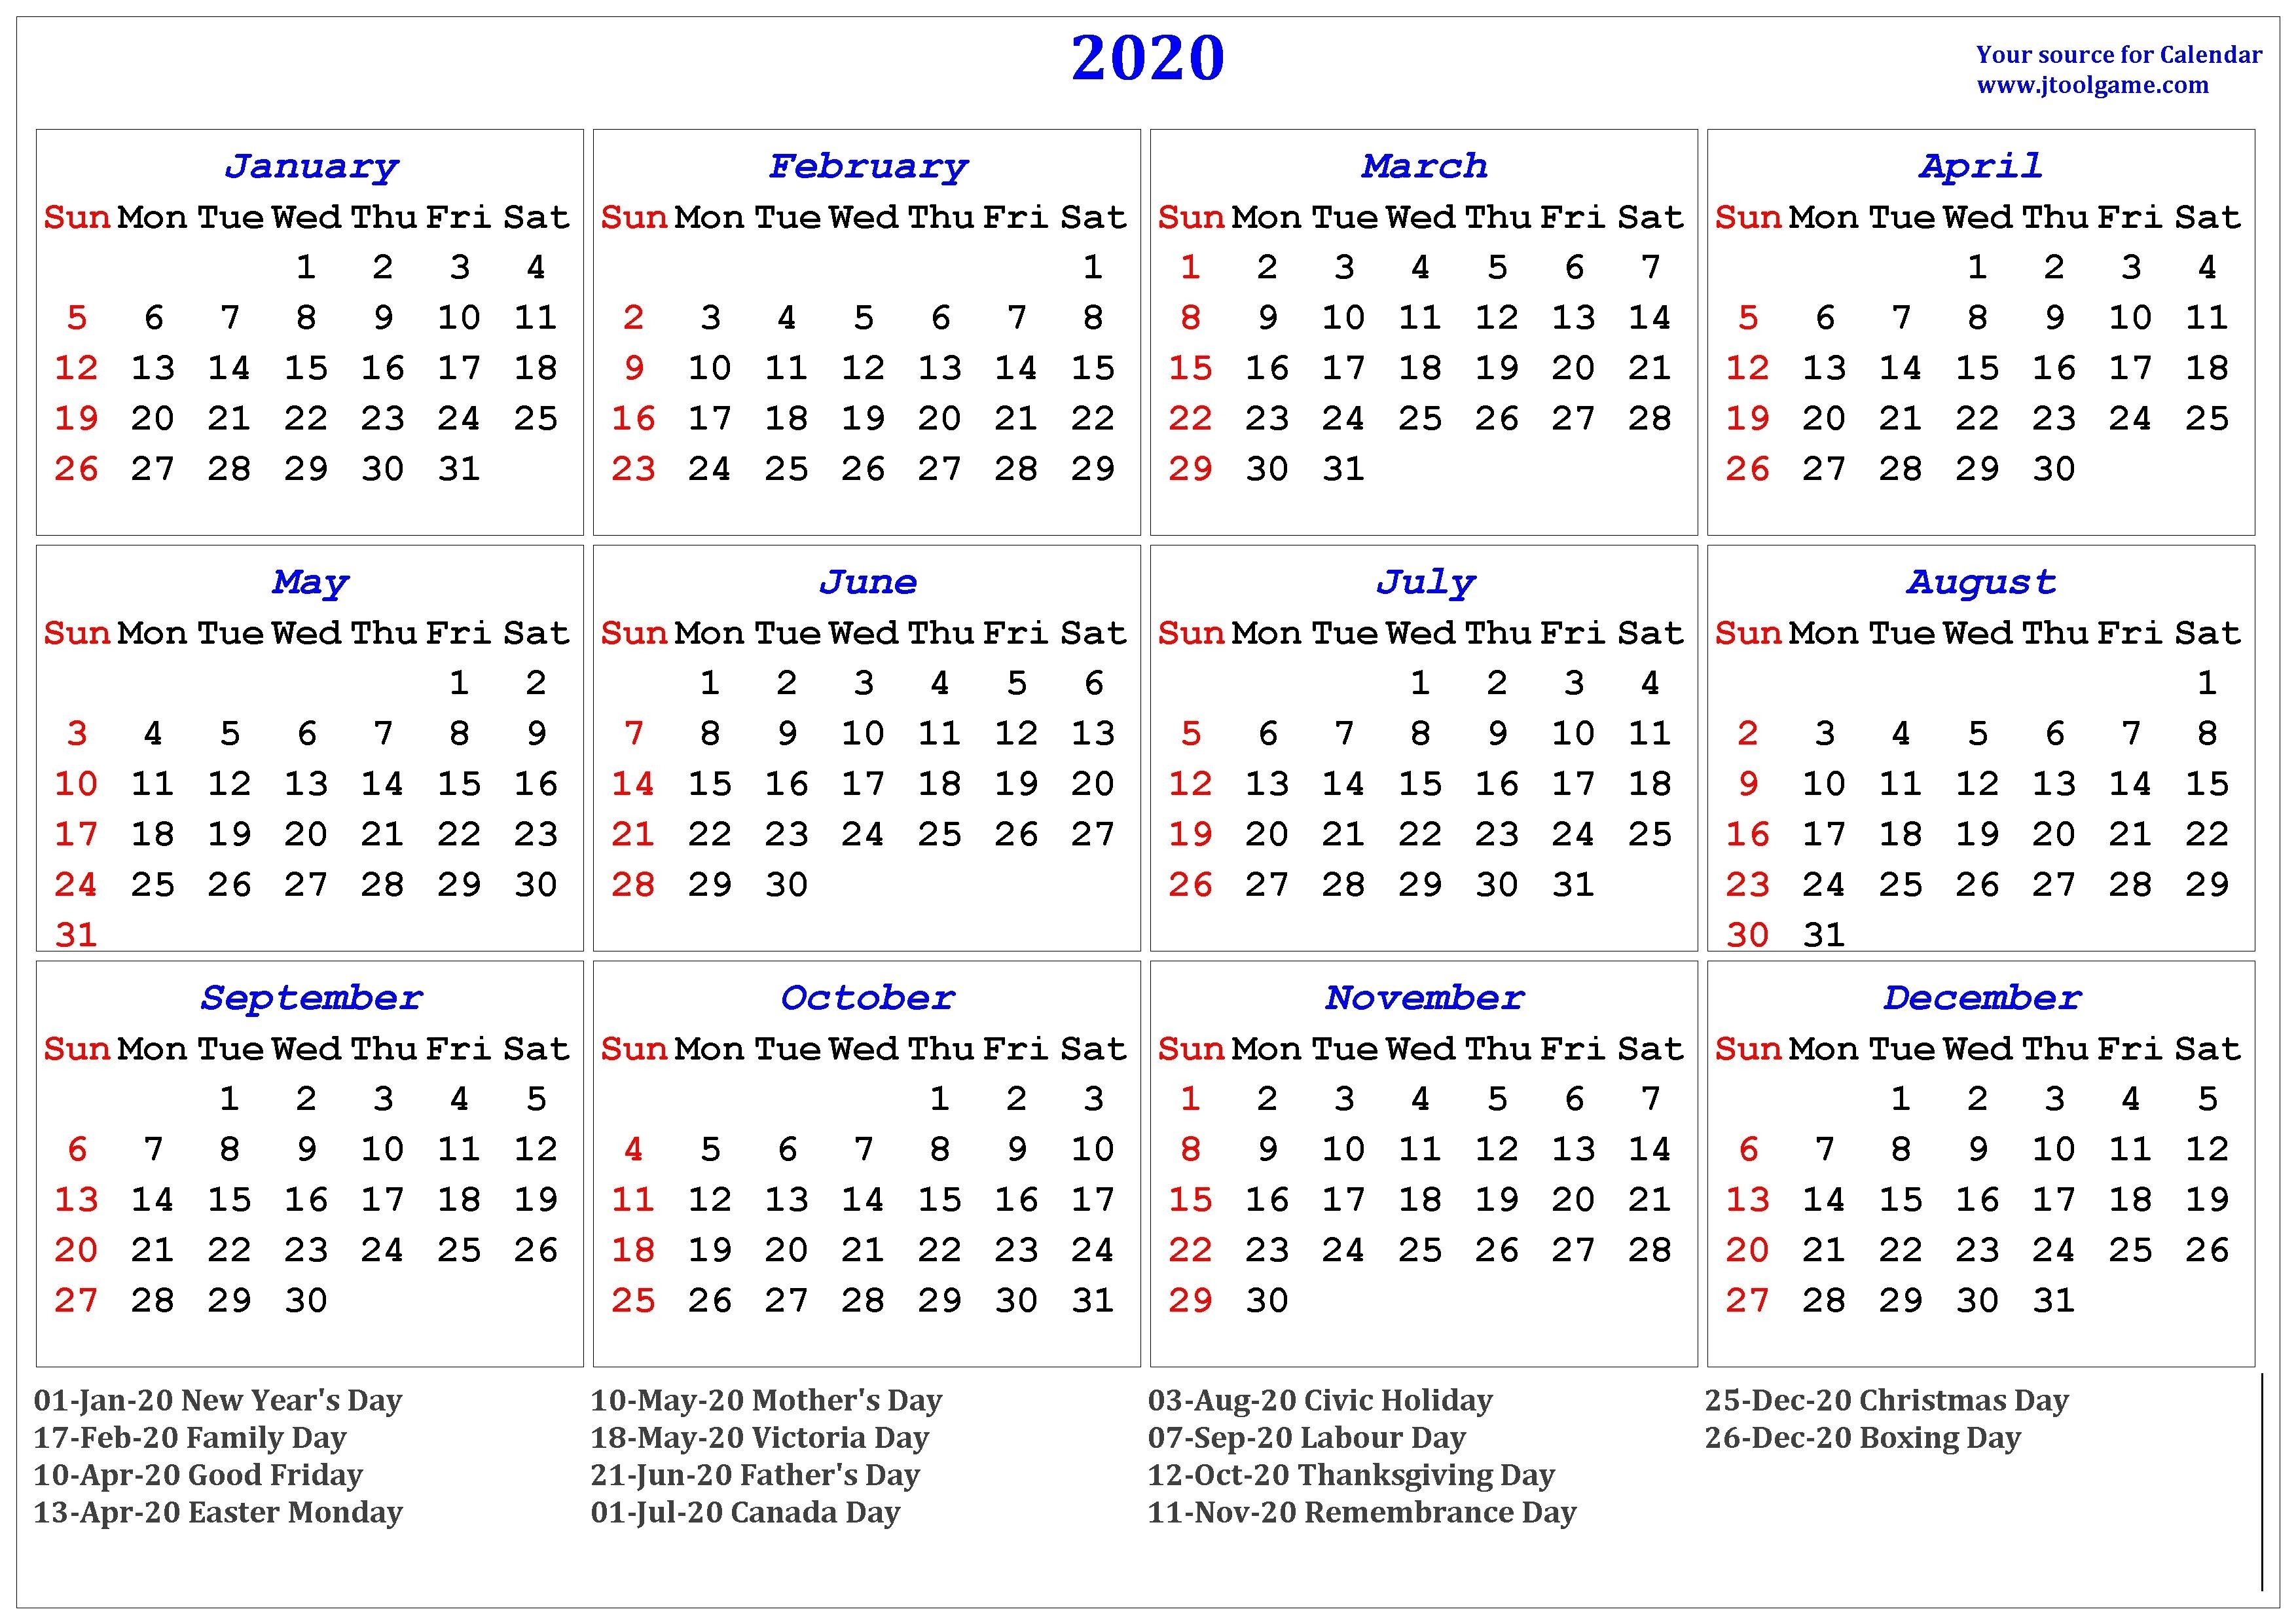 2020 Calendar Canada Stat Holidays